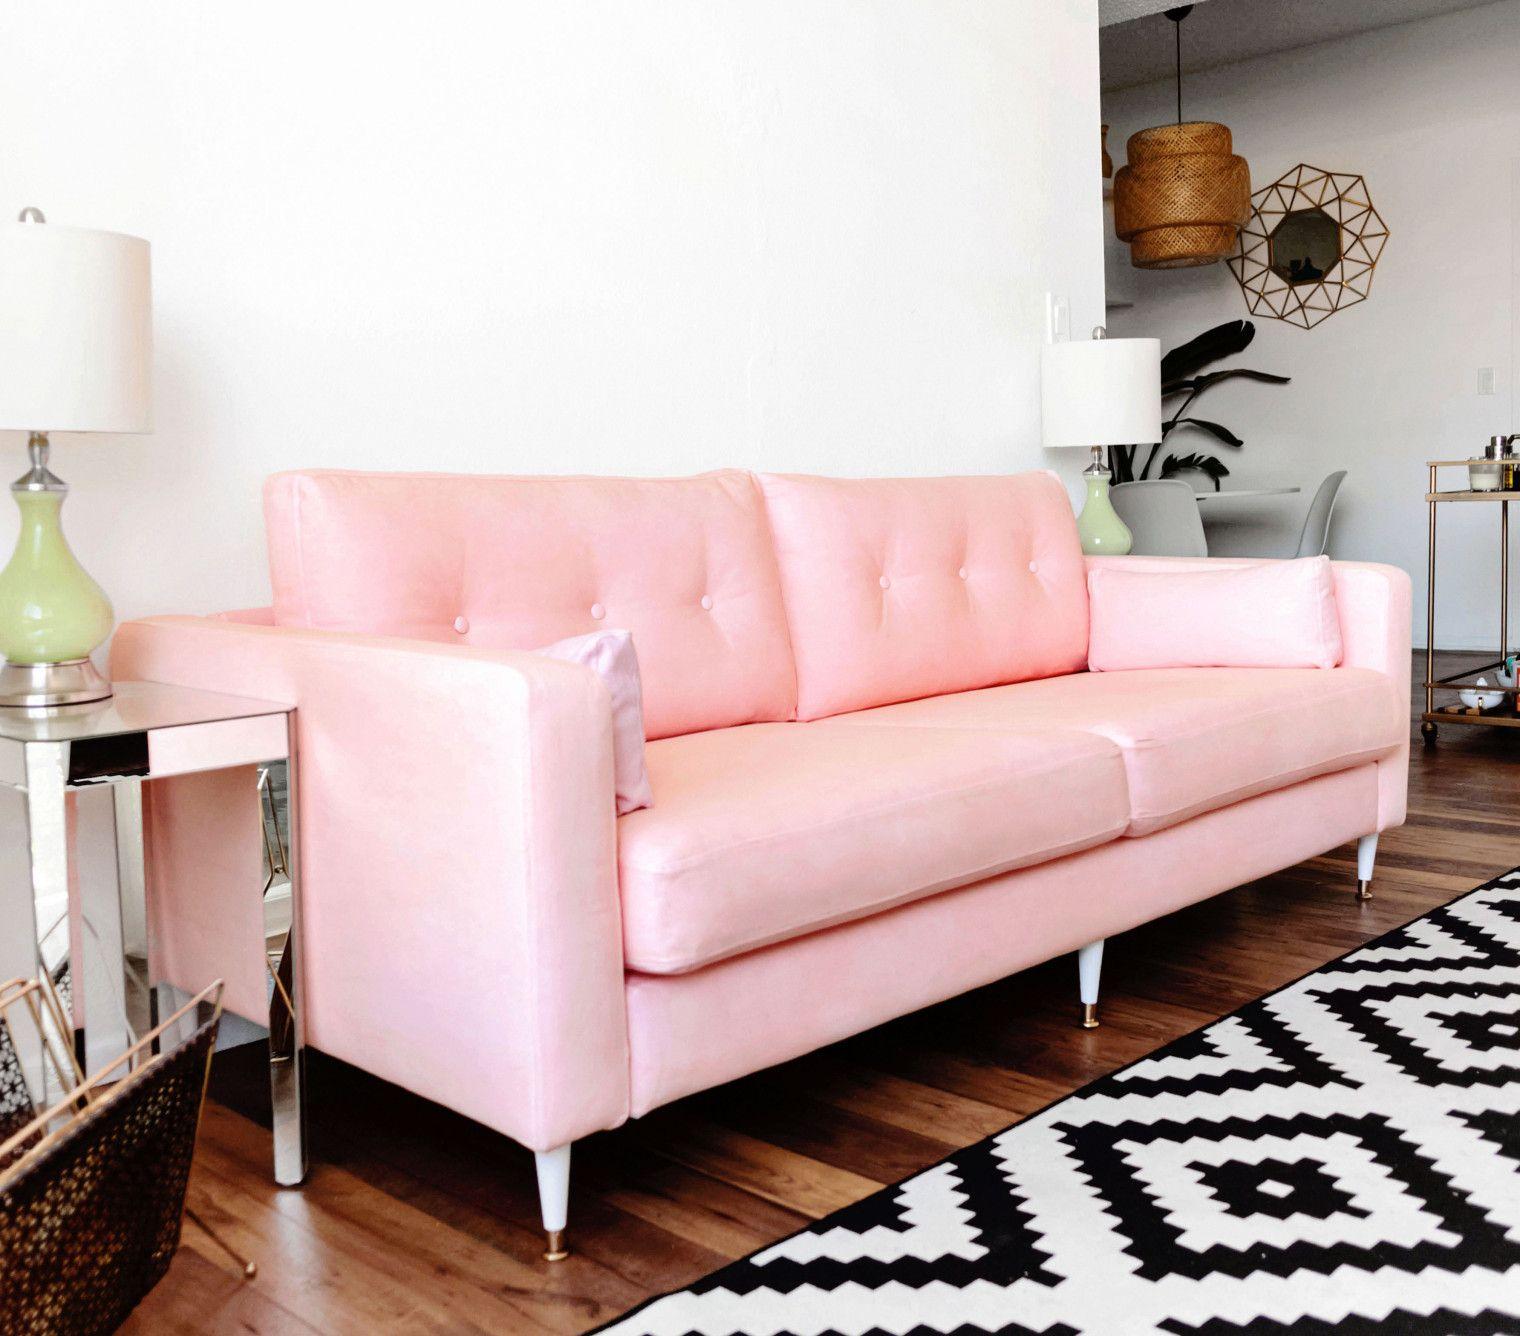 Pink Sofa Ikea Klippan Loveseat Ikea The Cover Is Easy To